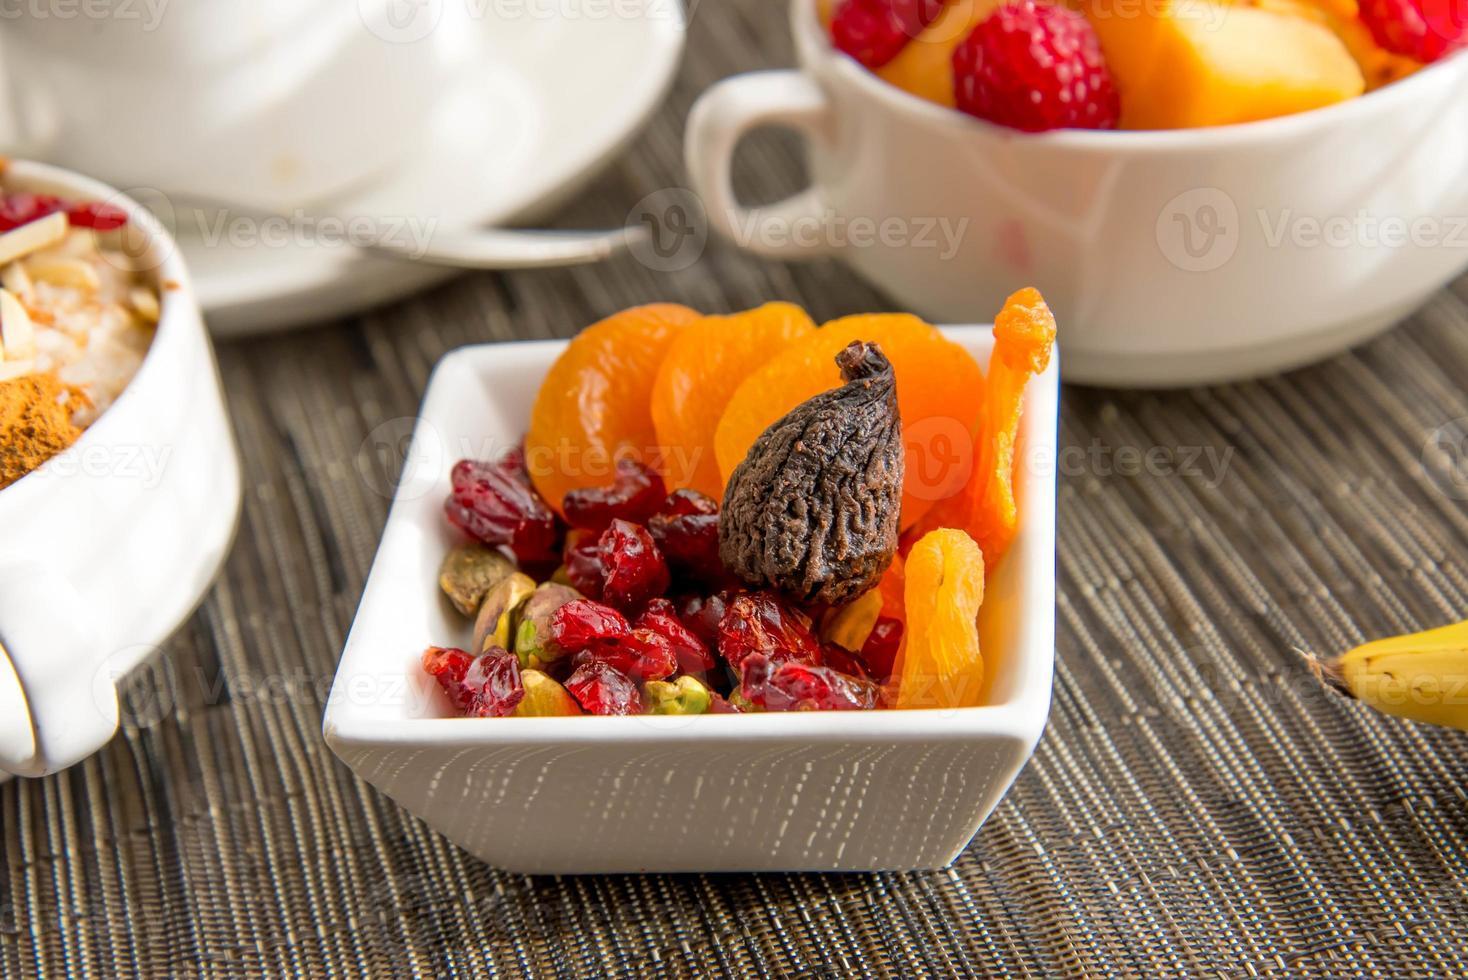 voedzame ontbijtomgeving met havermout en gedroogd fruit foto